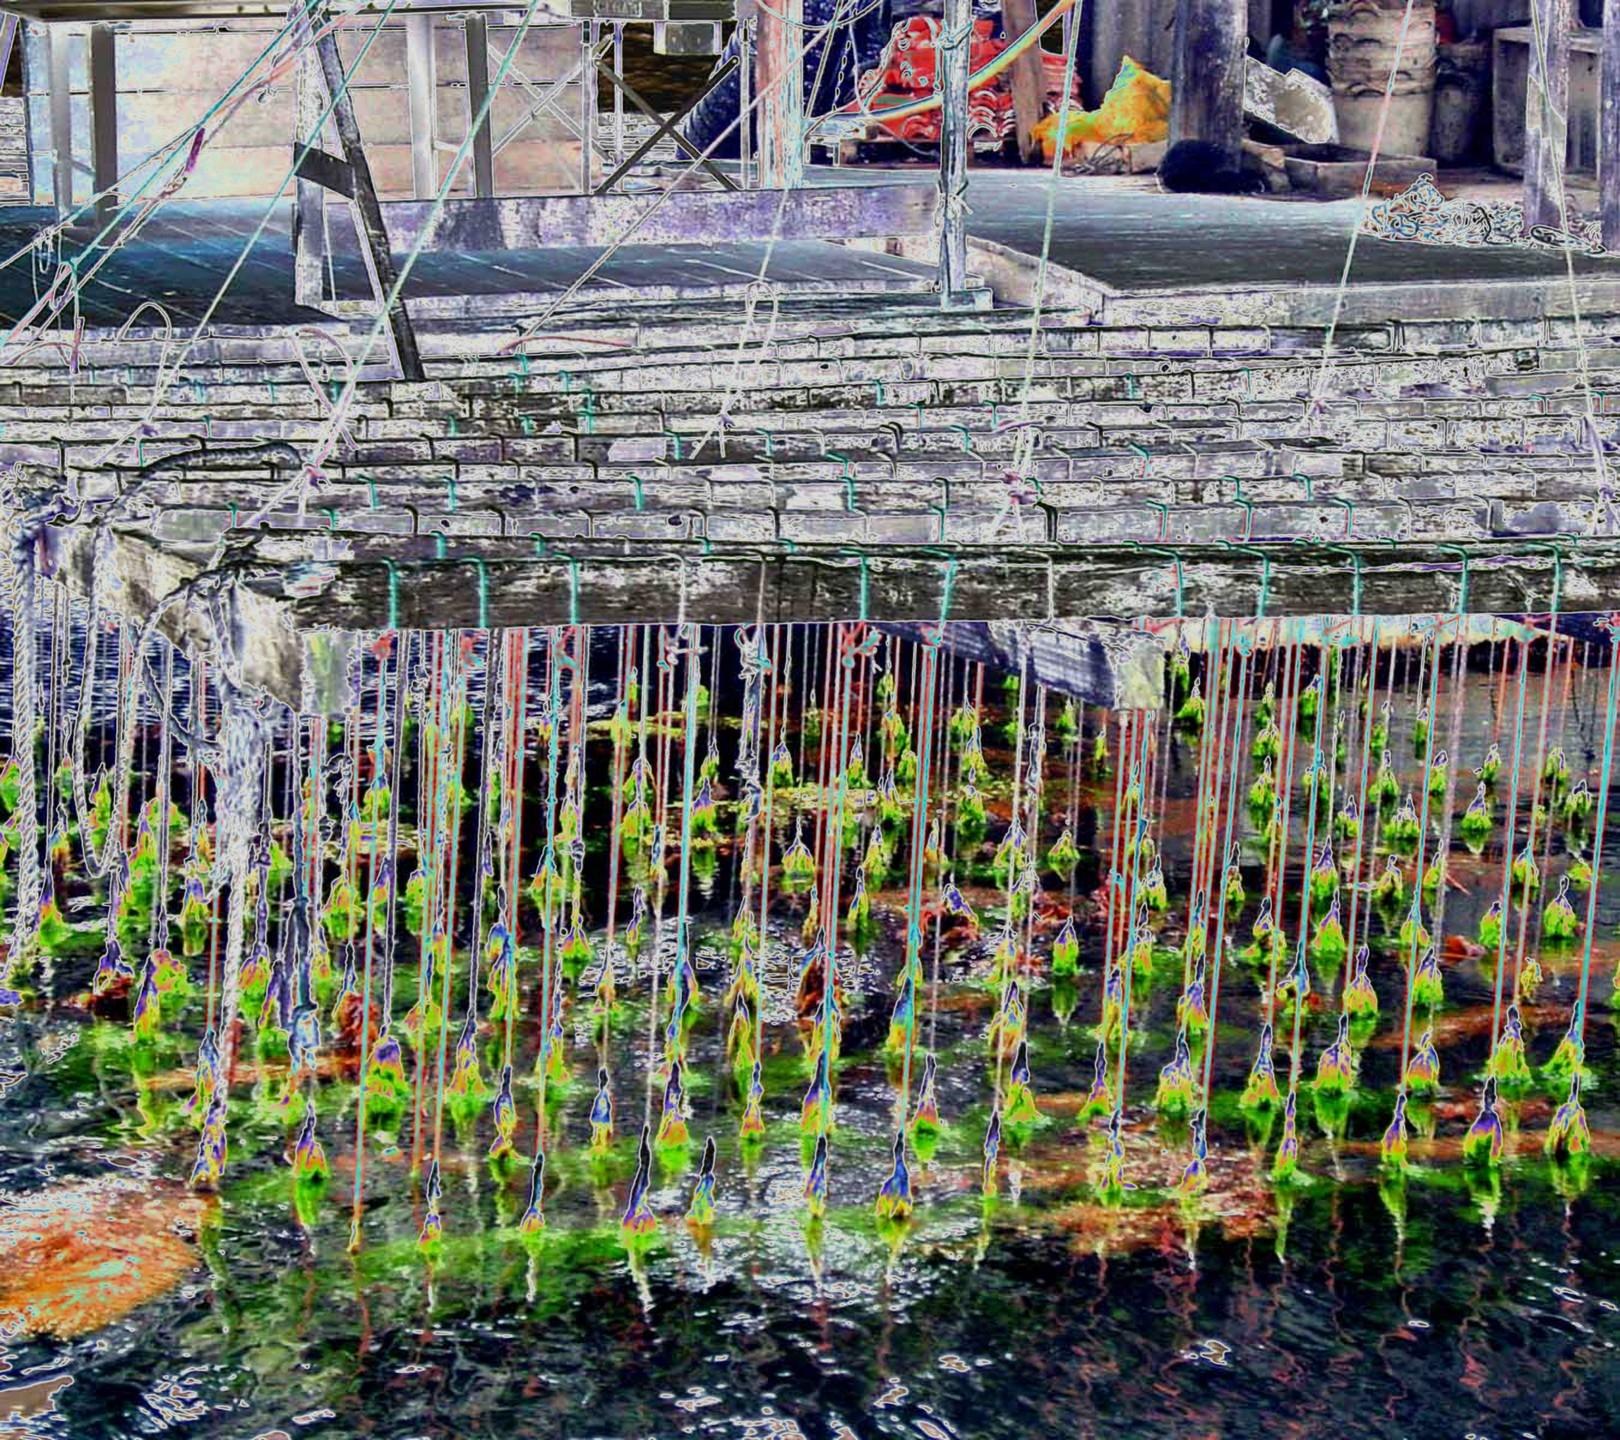 Ladislau da Regueira   Floating marine platform project # Strings (2008)